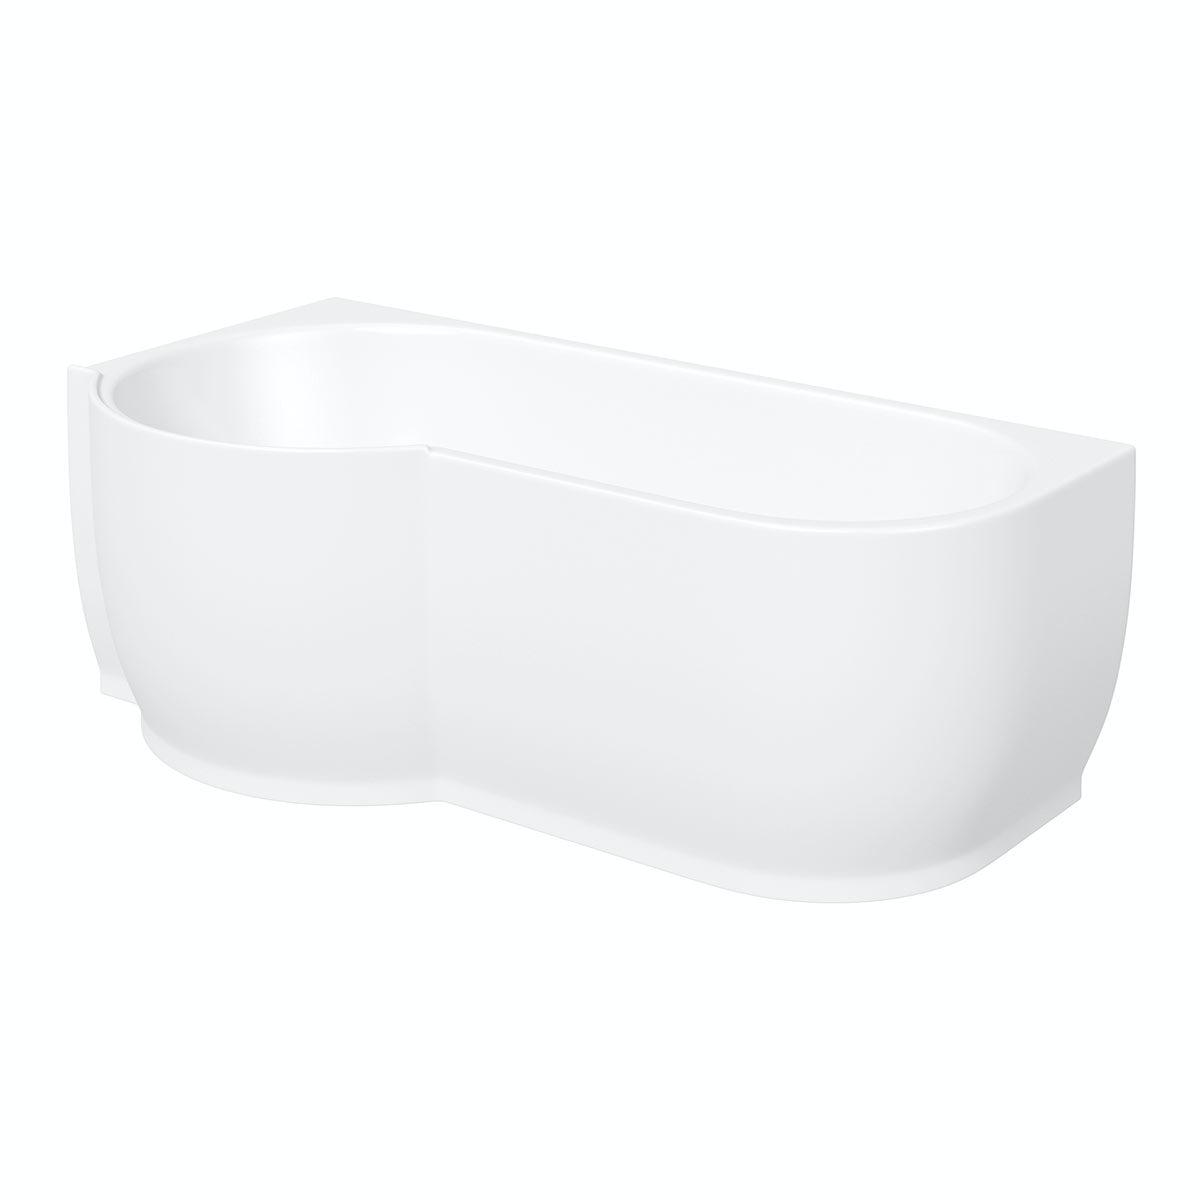 mode harrison left handed p shaped shower bath victoriaplum com free delivery harrison left handed freestanding bath